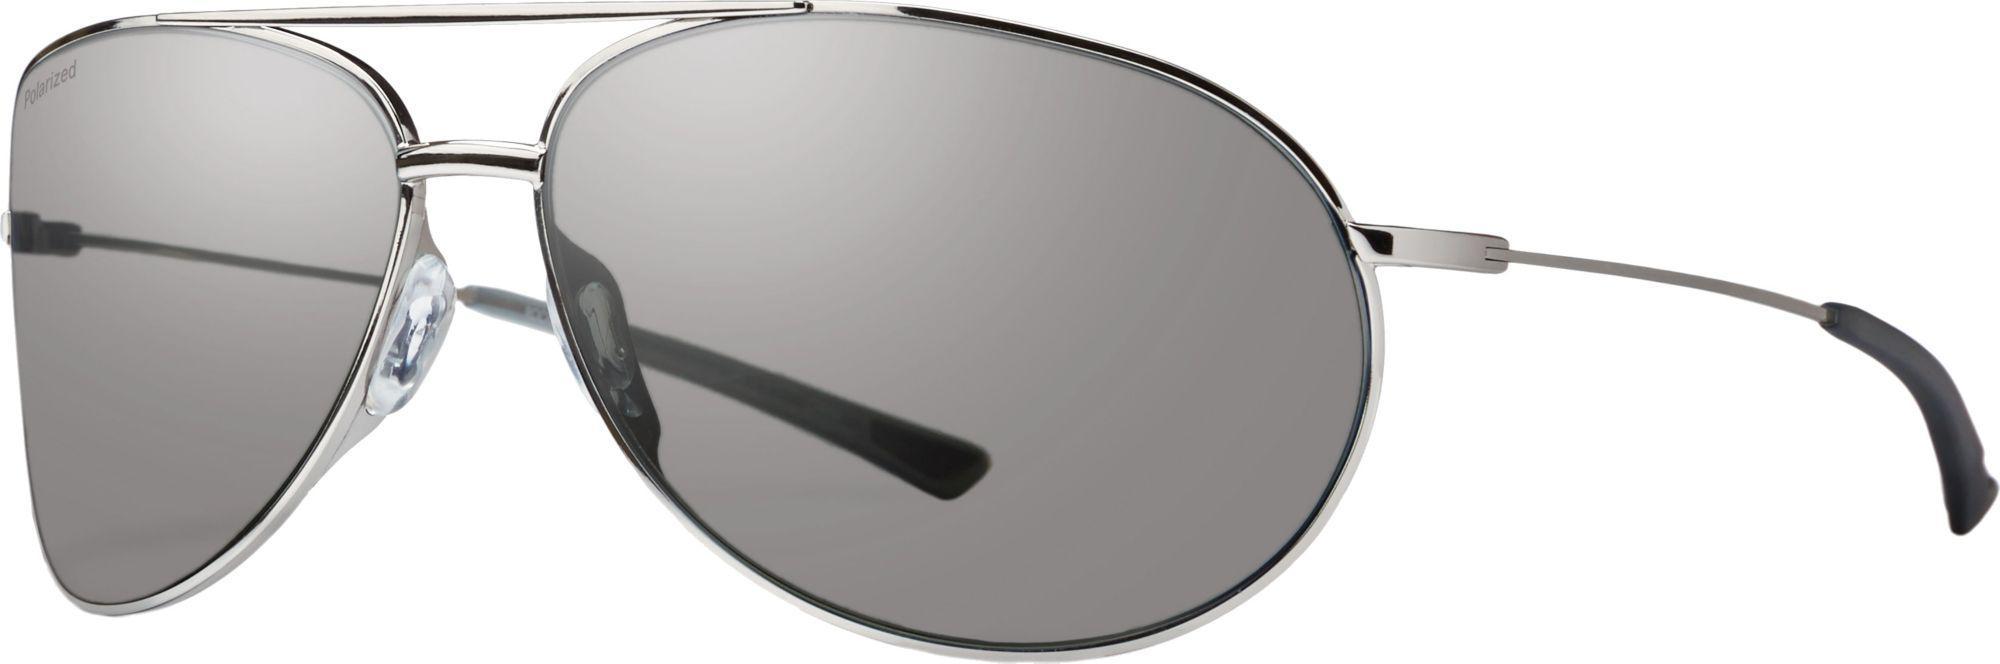 203a5445a3f Lyst - Smith Optics Rockford Polarized Sunglasses in Metallic for Men